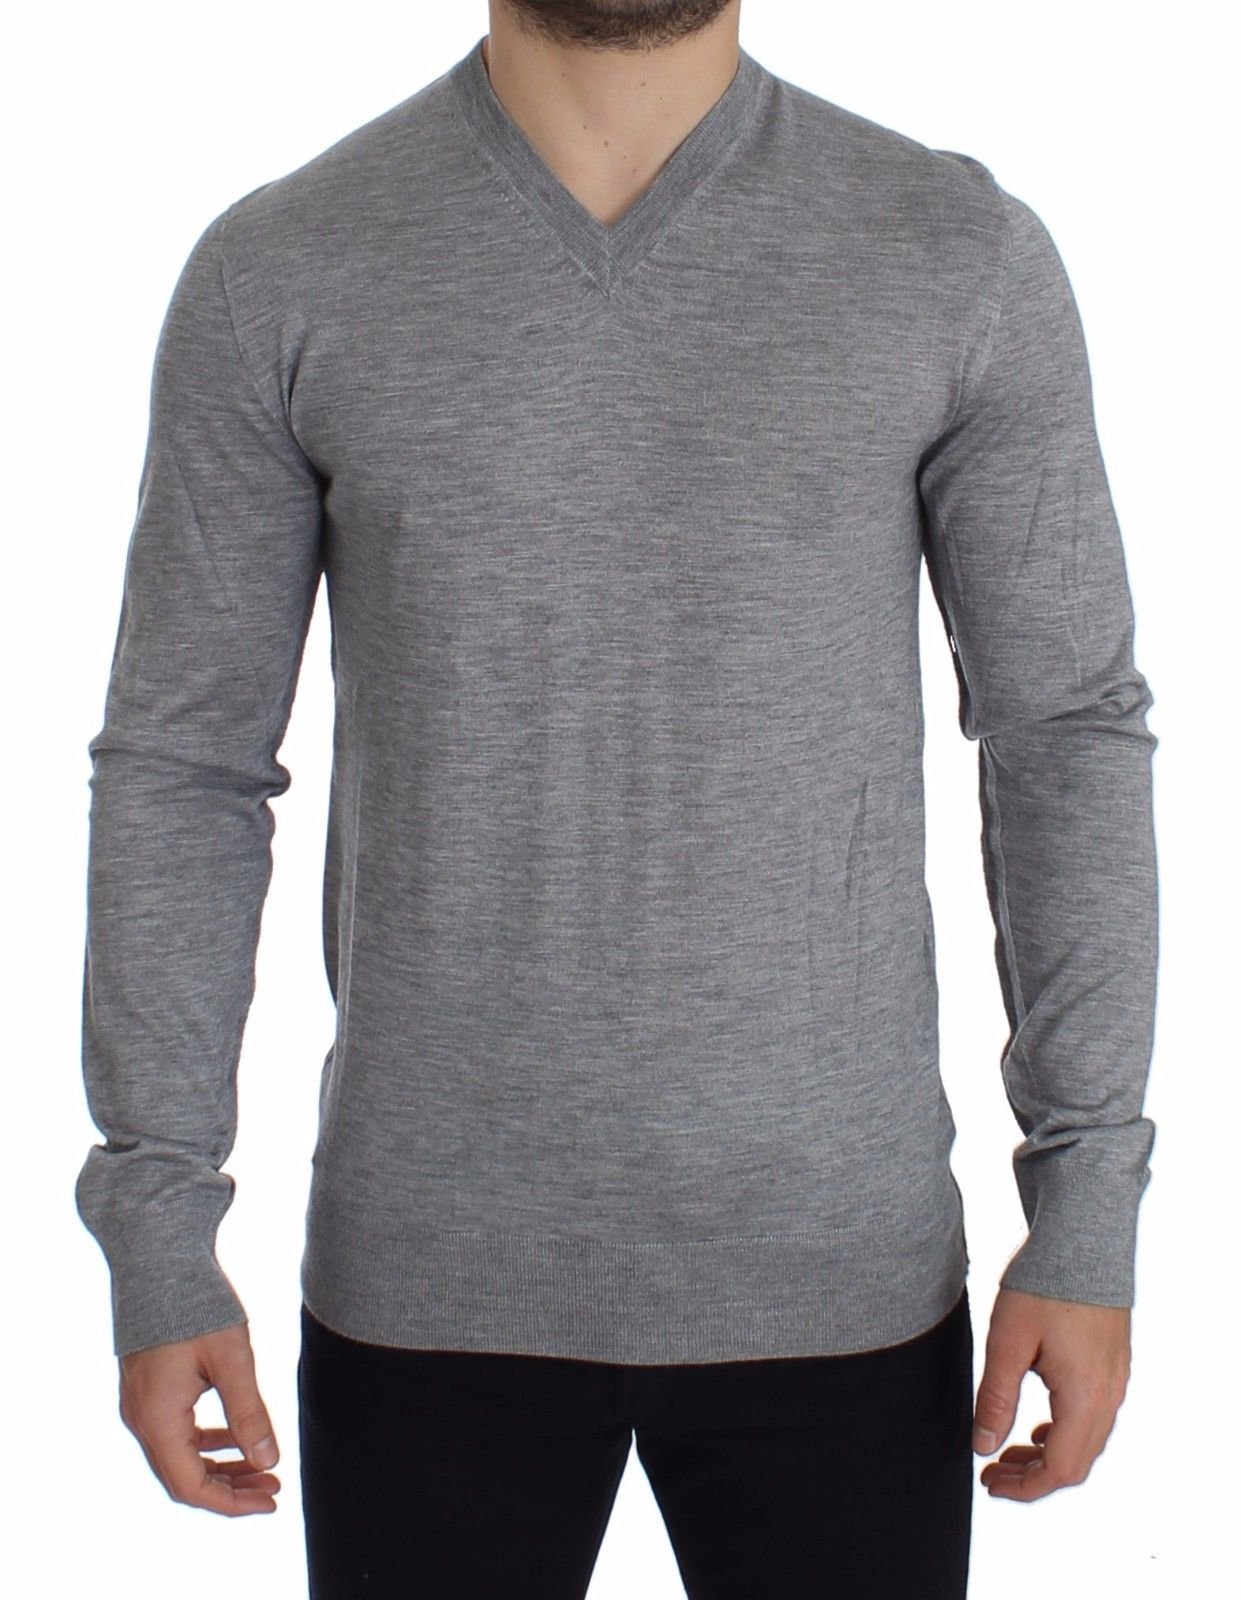 Dolce & Gabbana Men's Silk Cashmere V-neck Sweater Pullover Gray SIG14004 - IT44 | XS